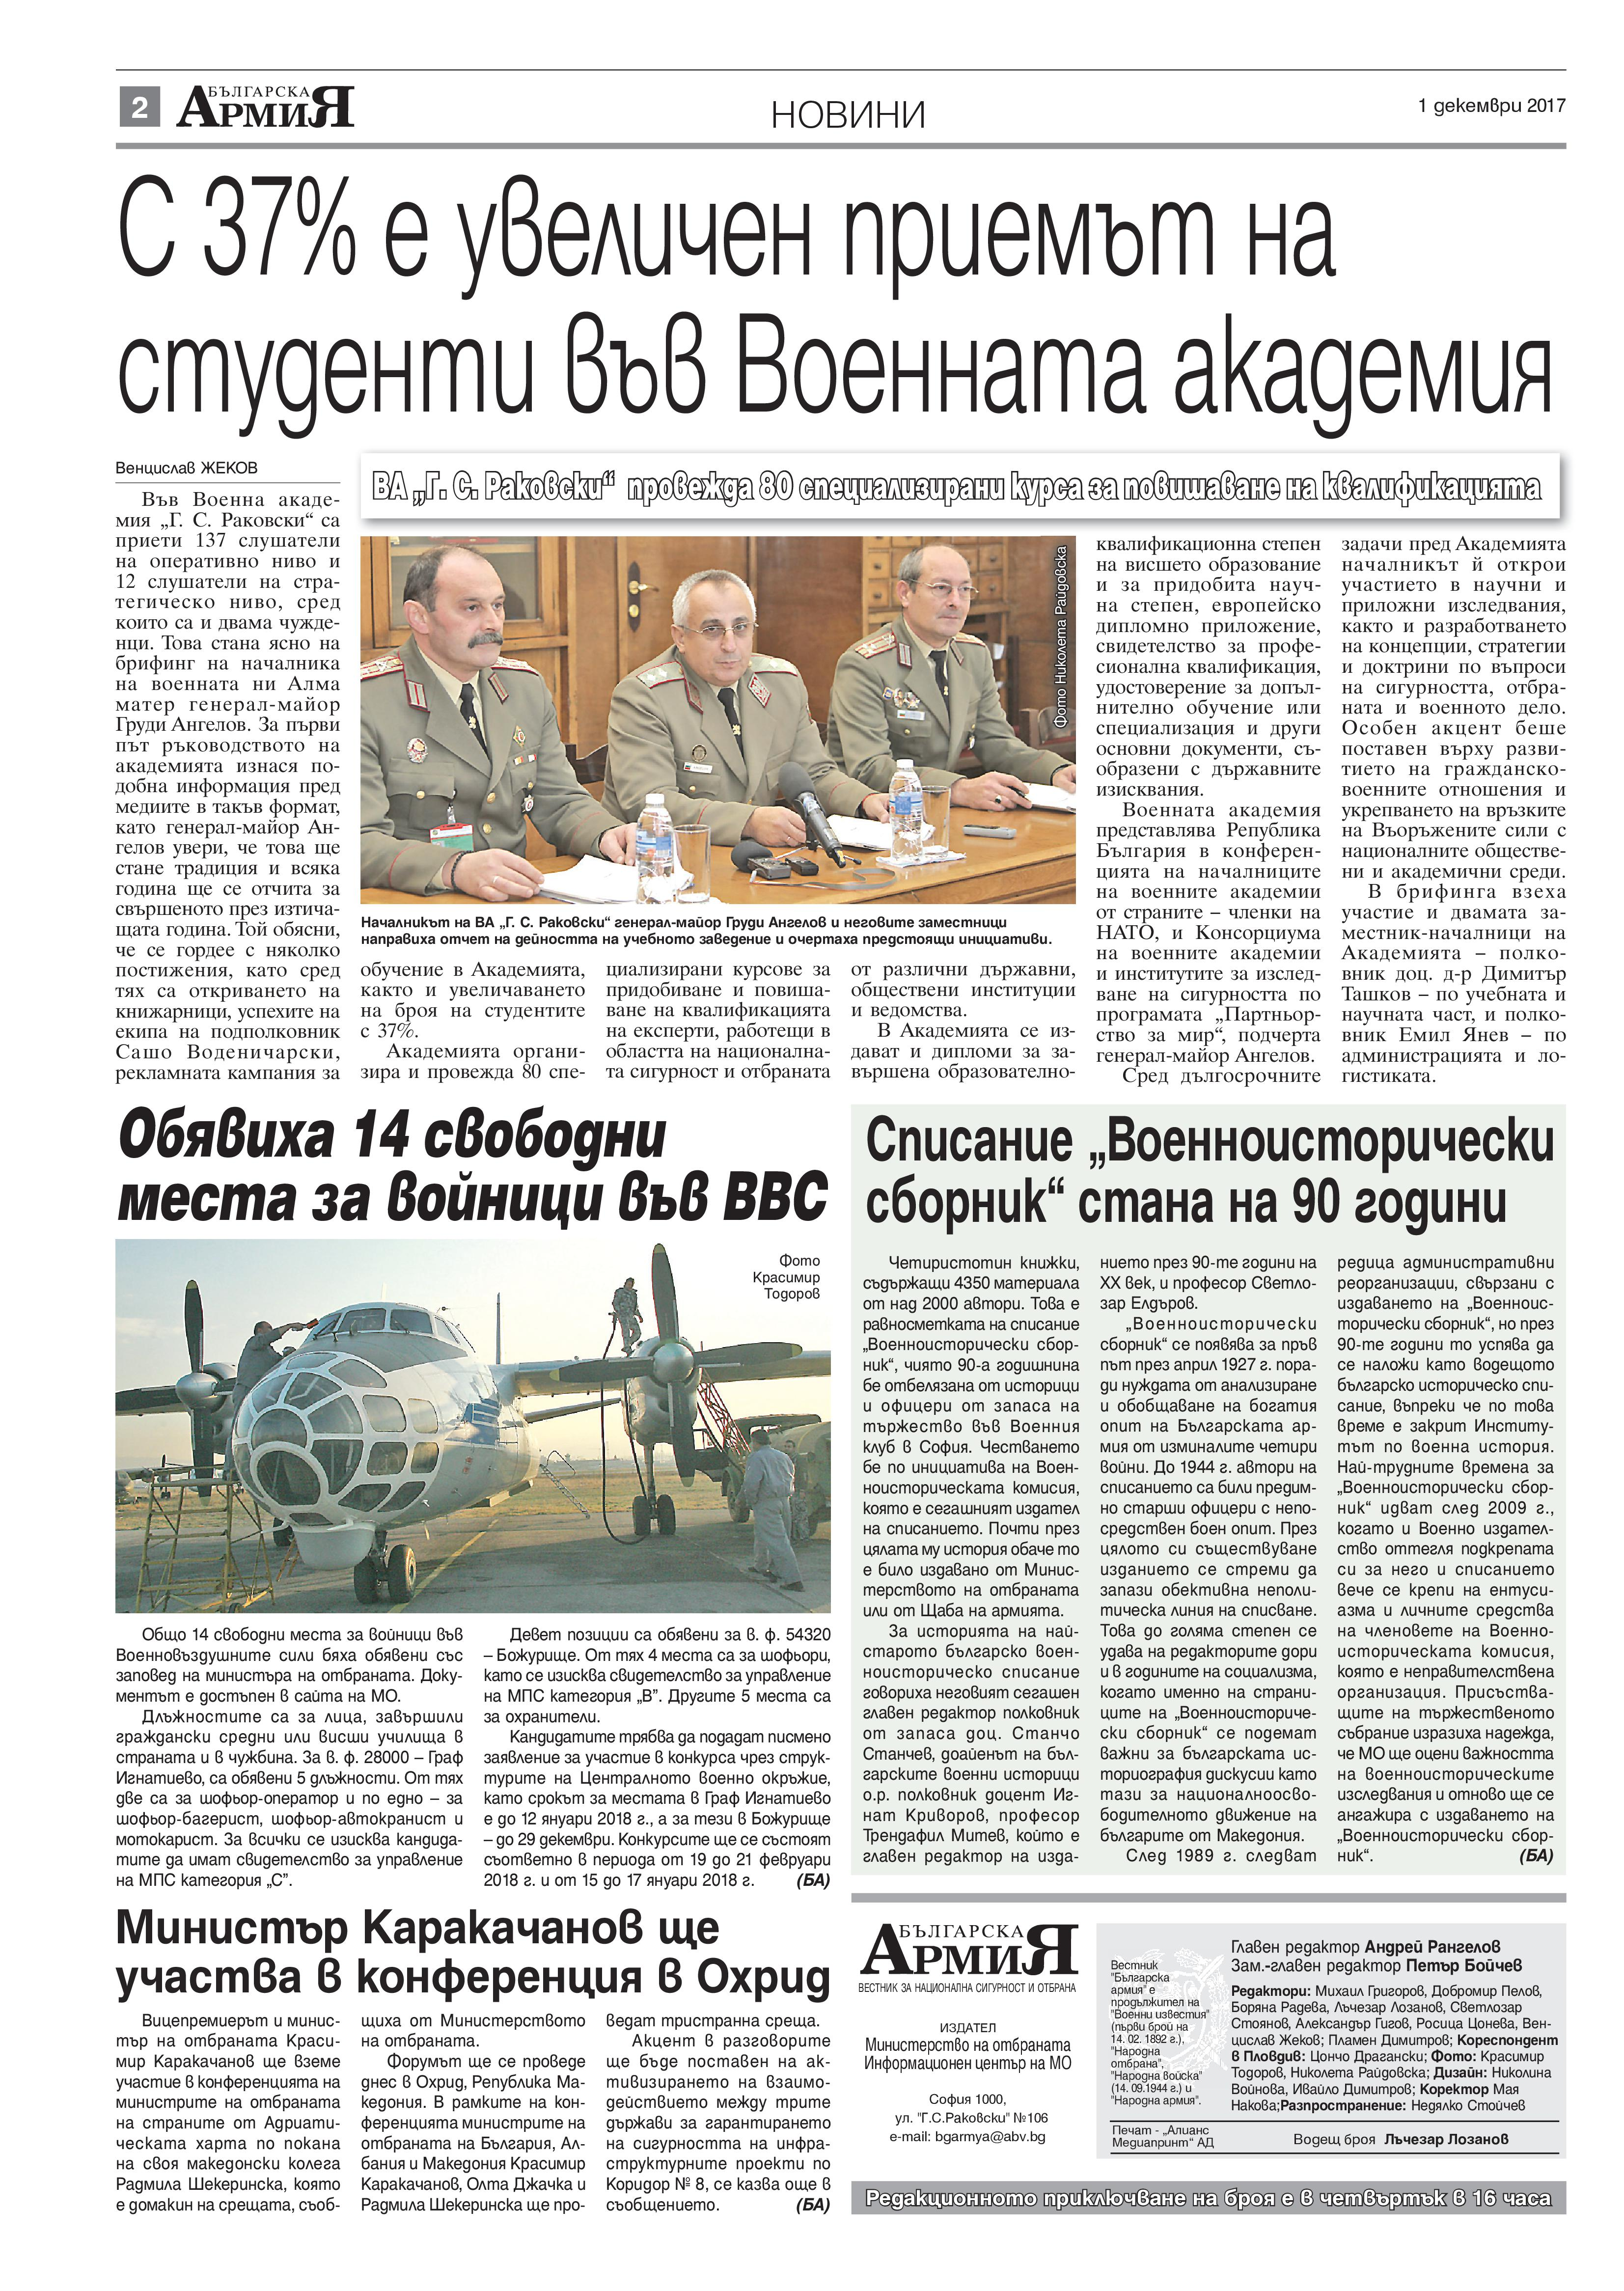 http://armymedia.bg/wp-content/uploads/2015/06/02-13.jpg